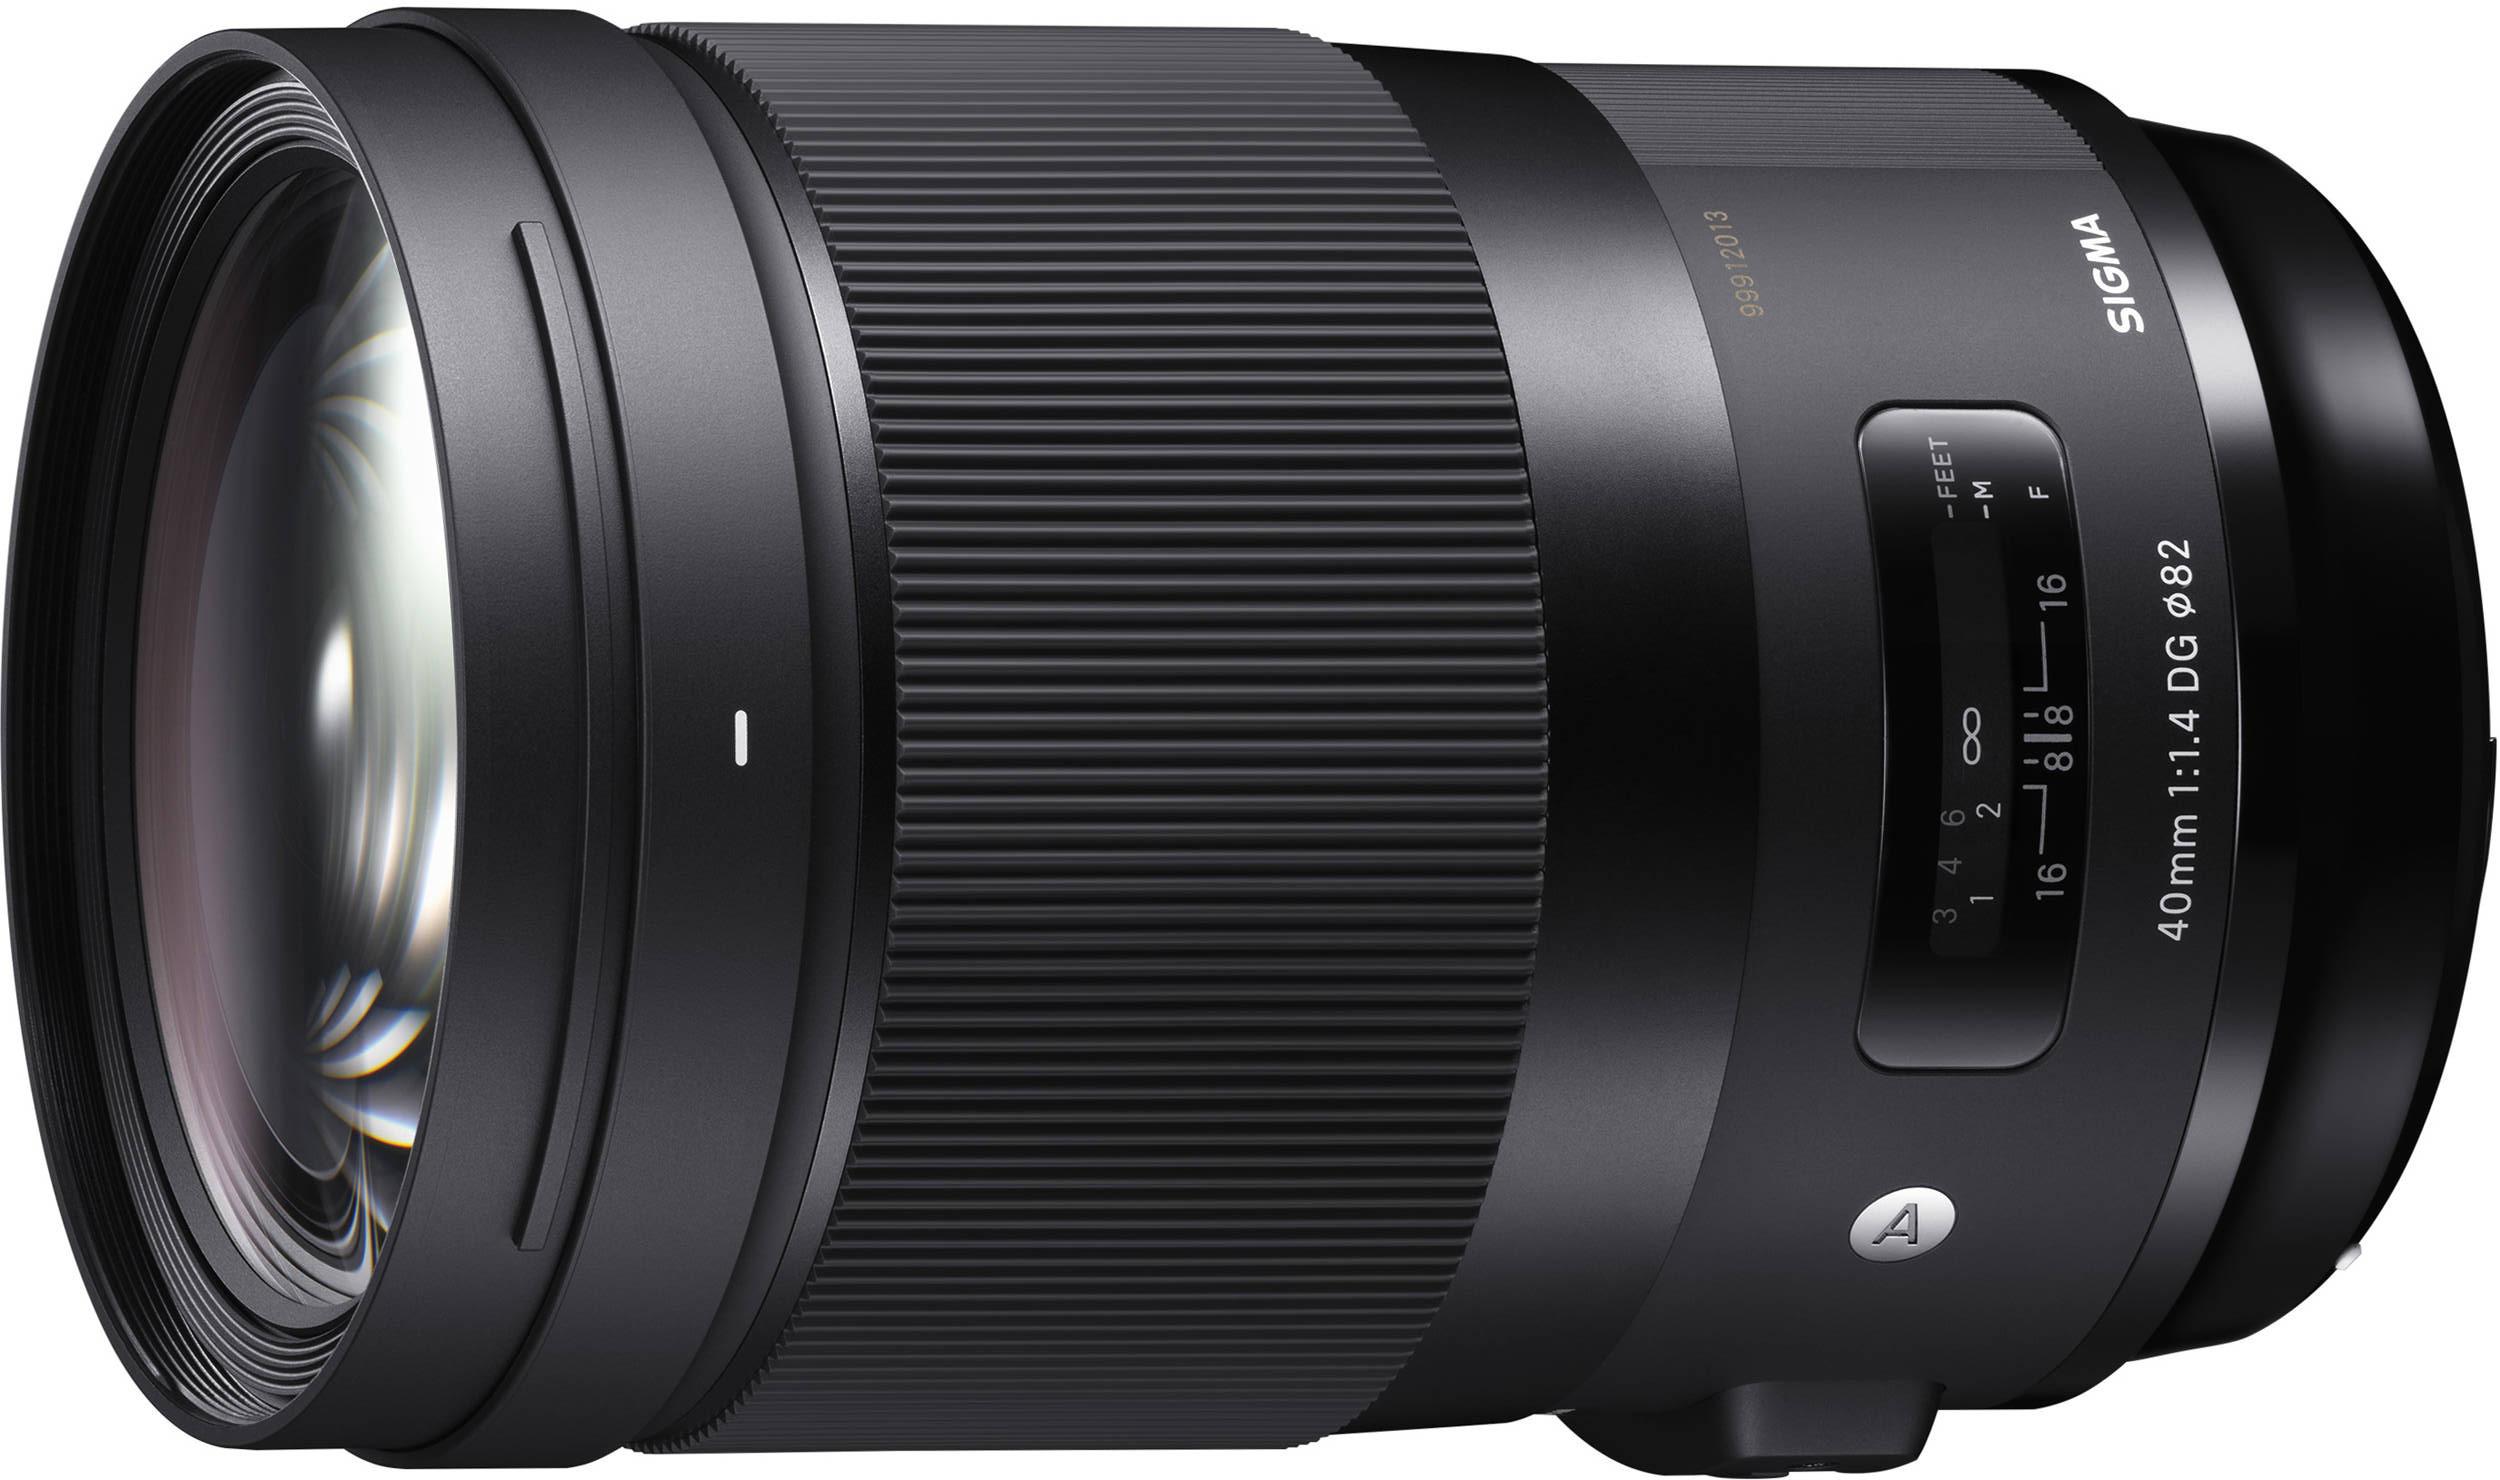 Sigma 40mm f/1.4 DG HSM Art objektiiv Canonile